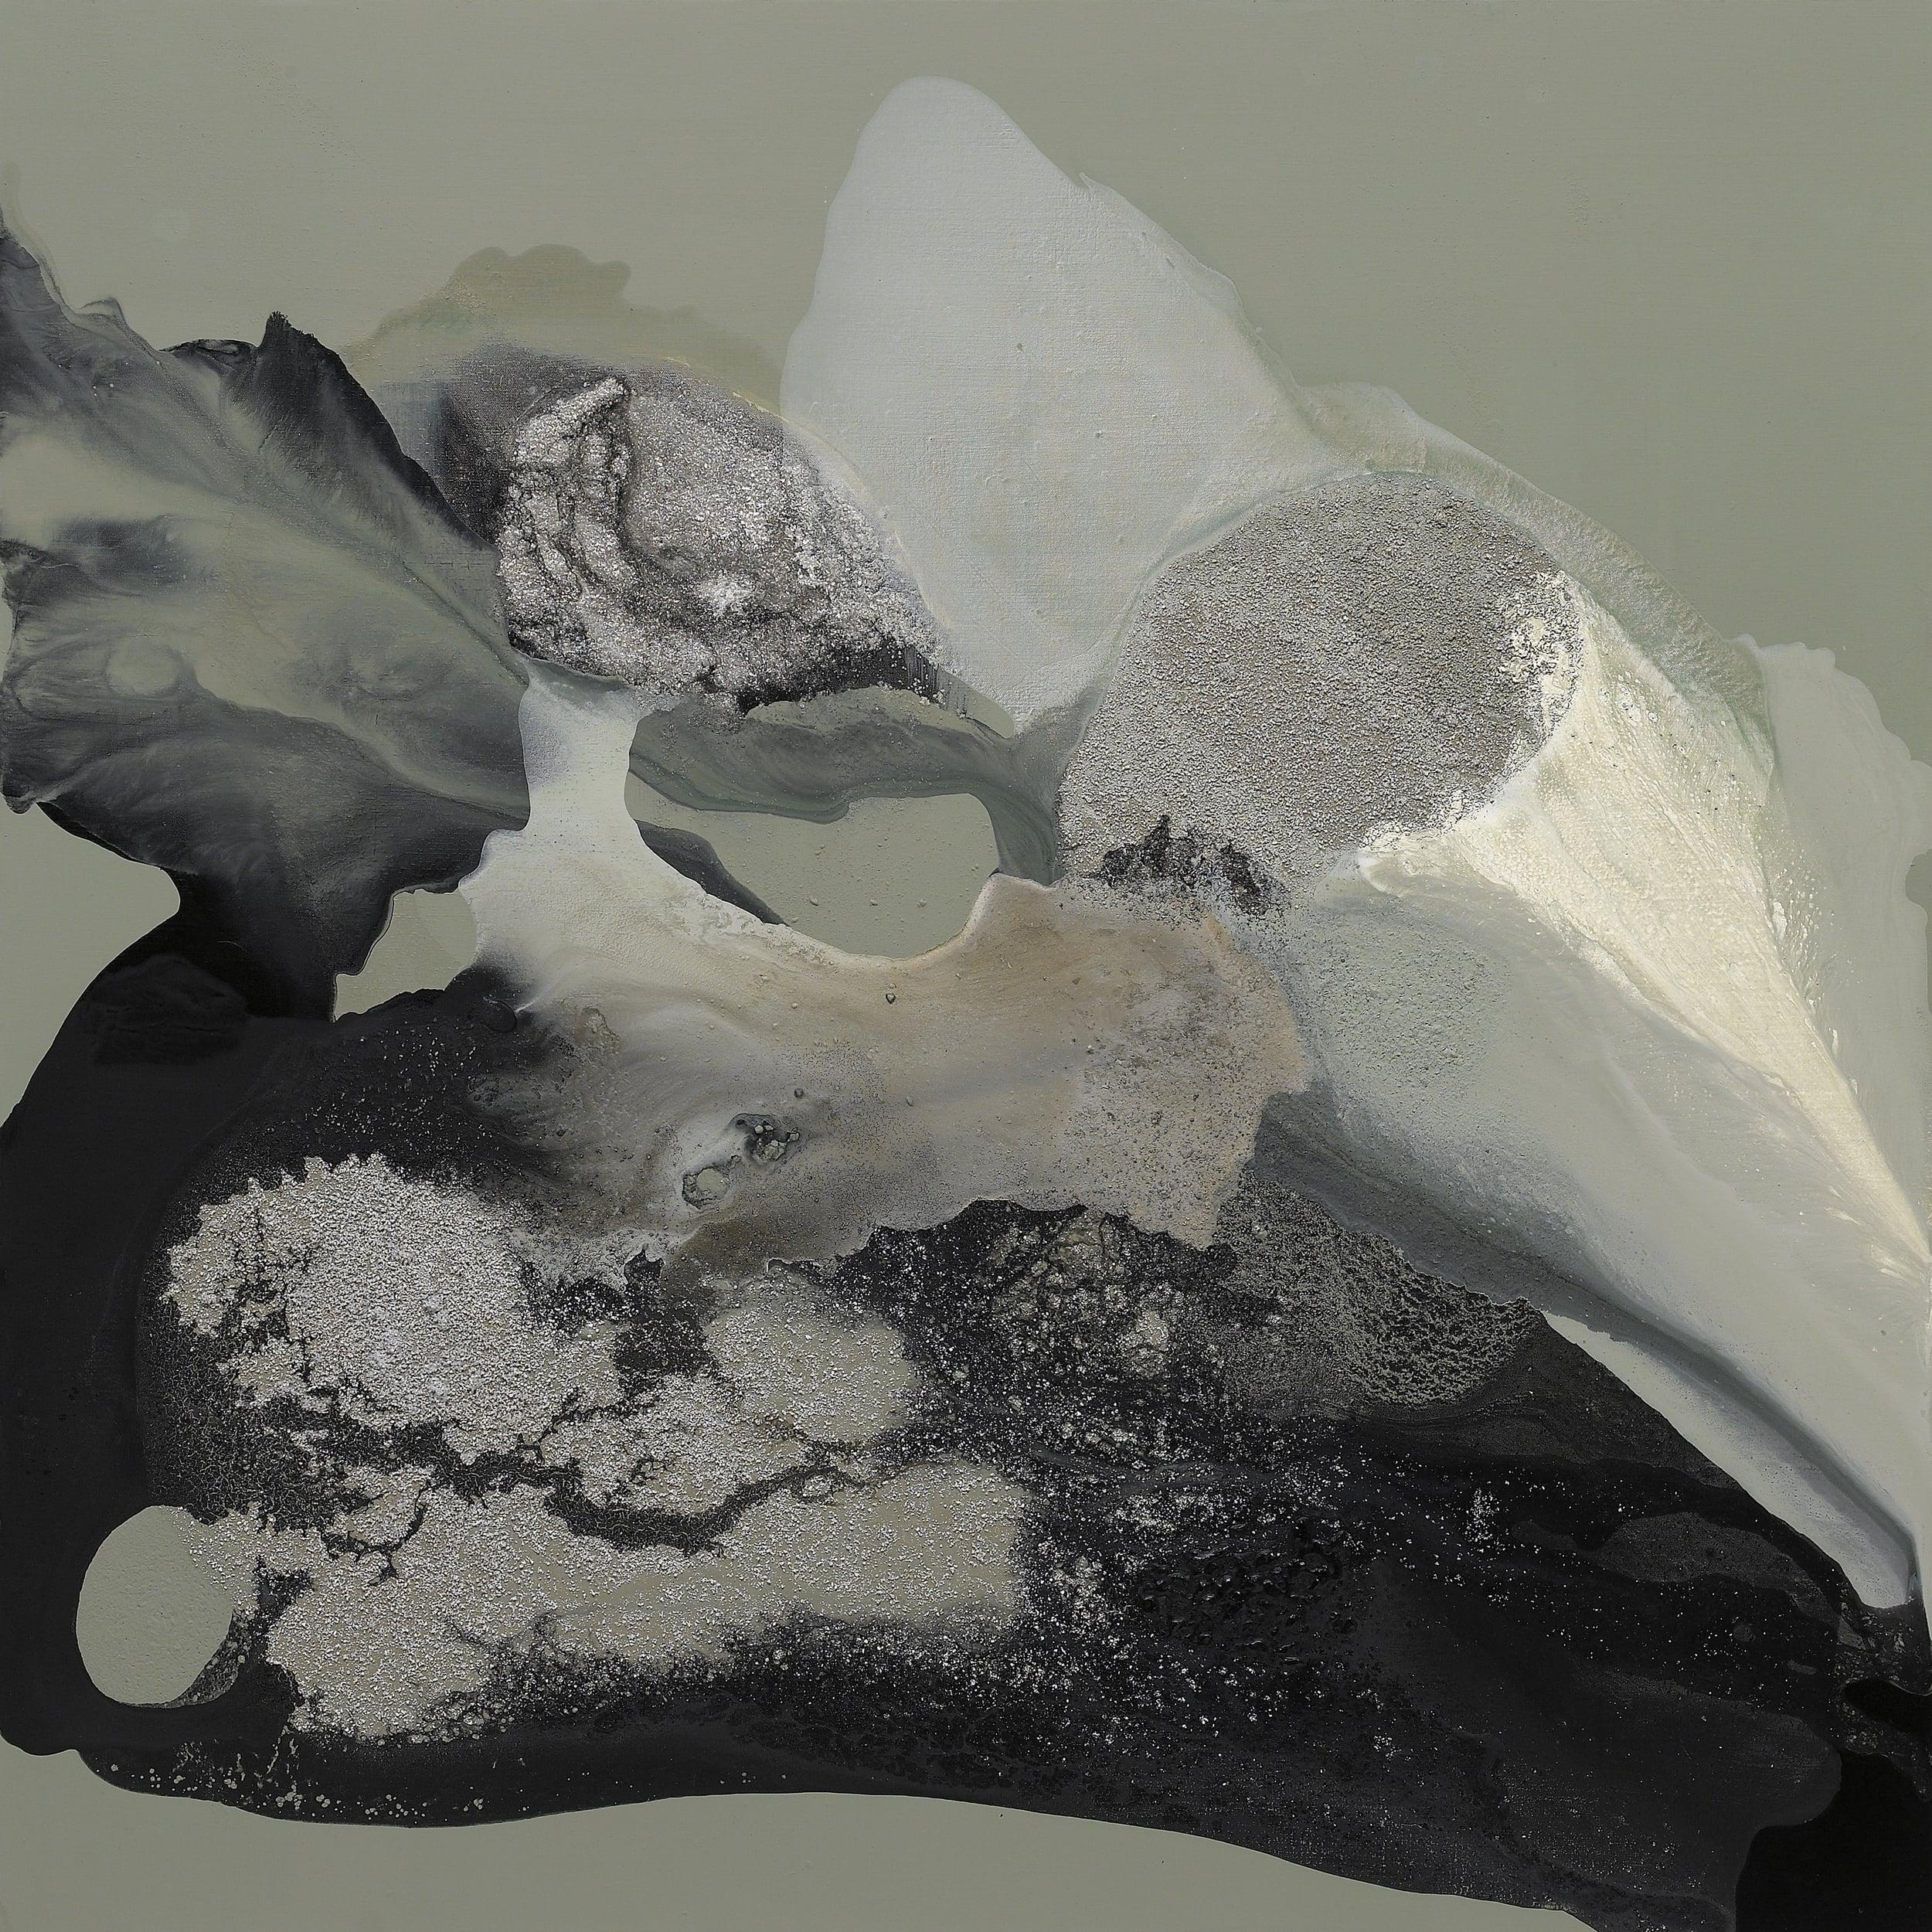 figure_01  acrylic and pumice  gel on canvas  130 cm X 130 cm  2014